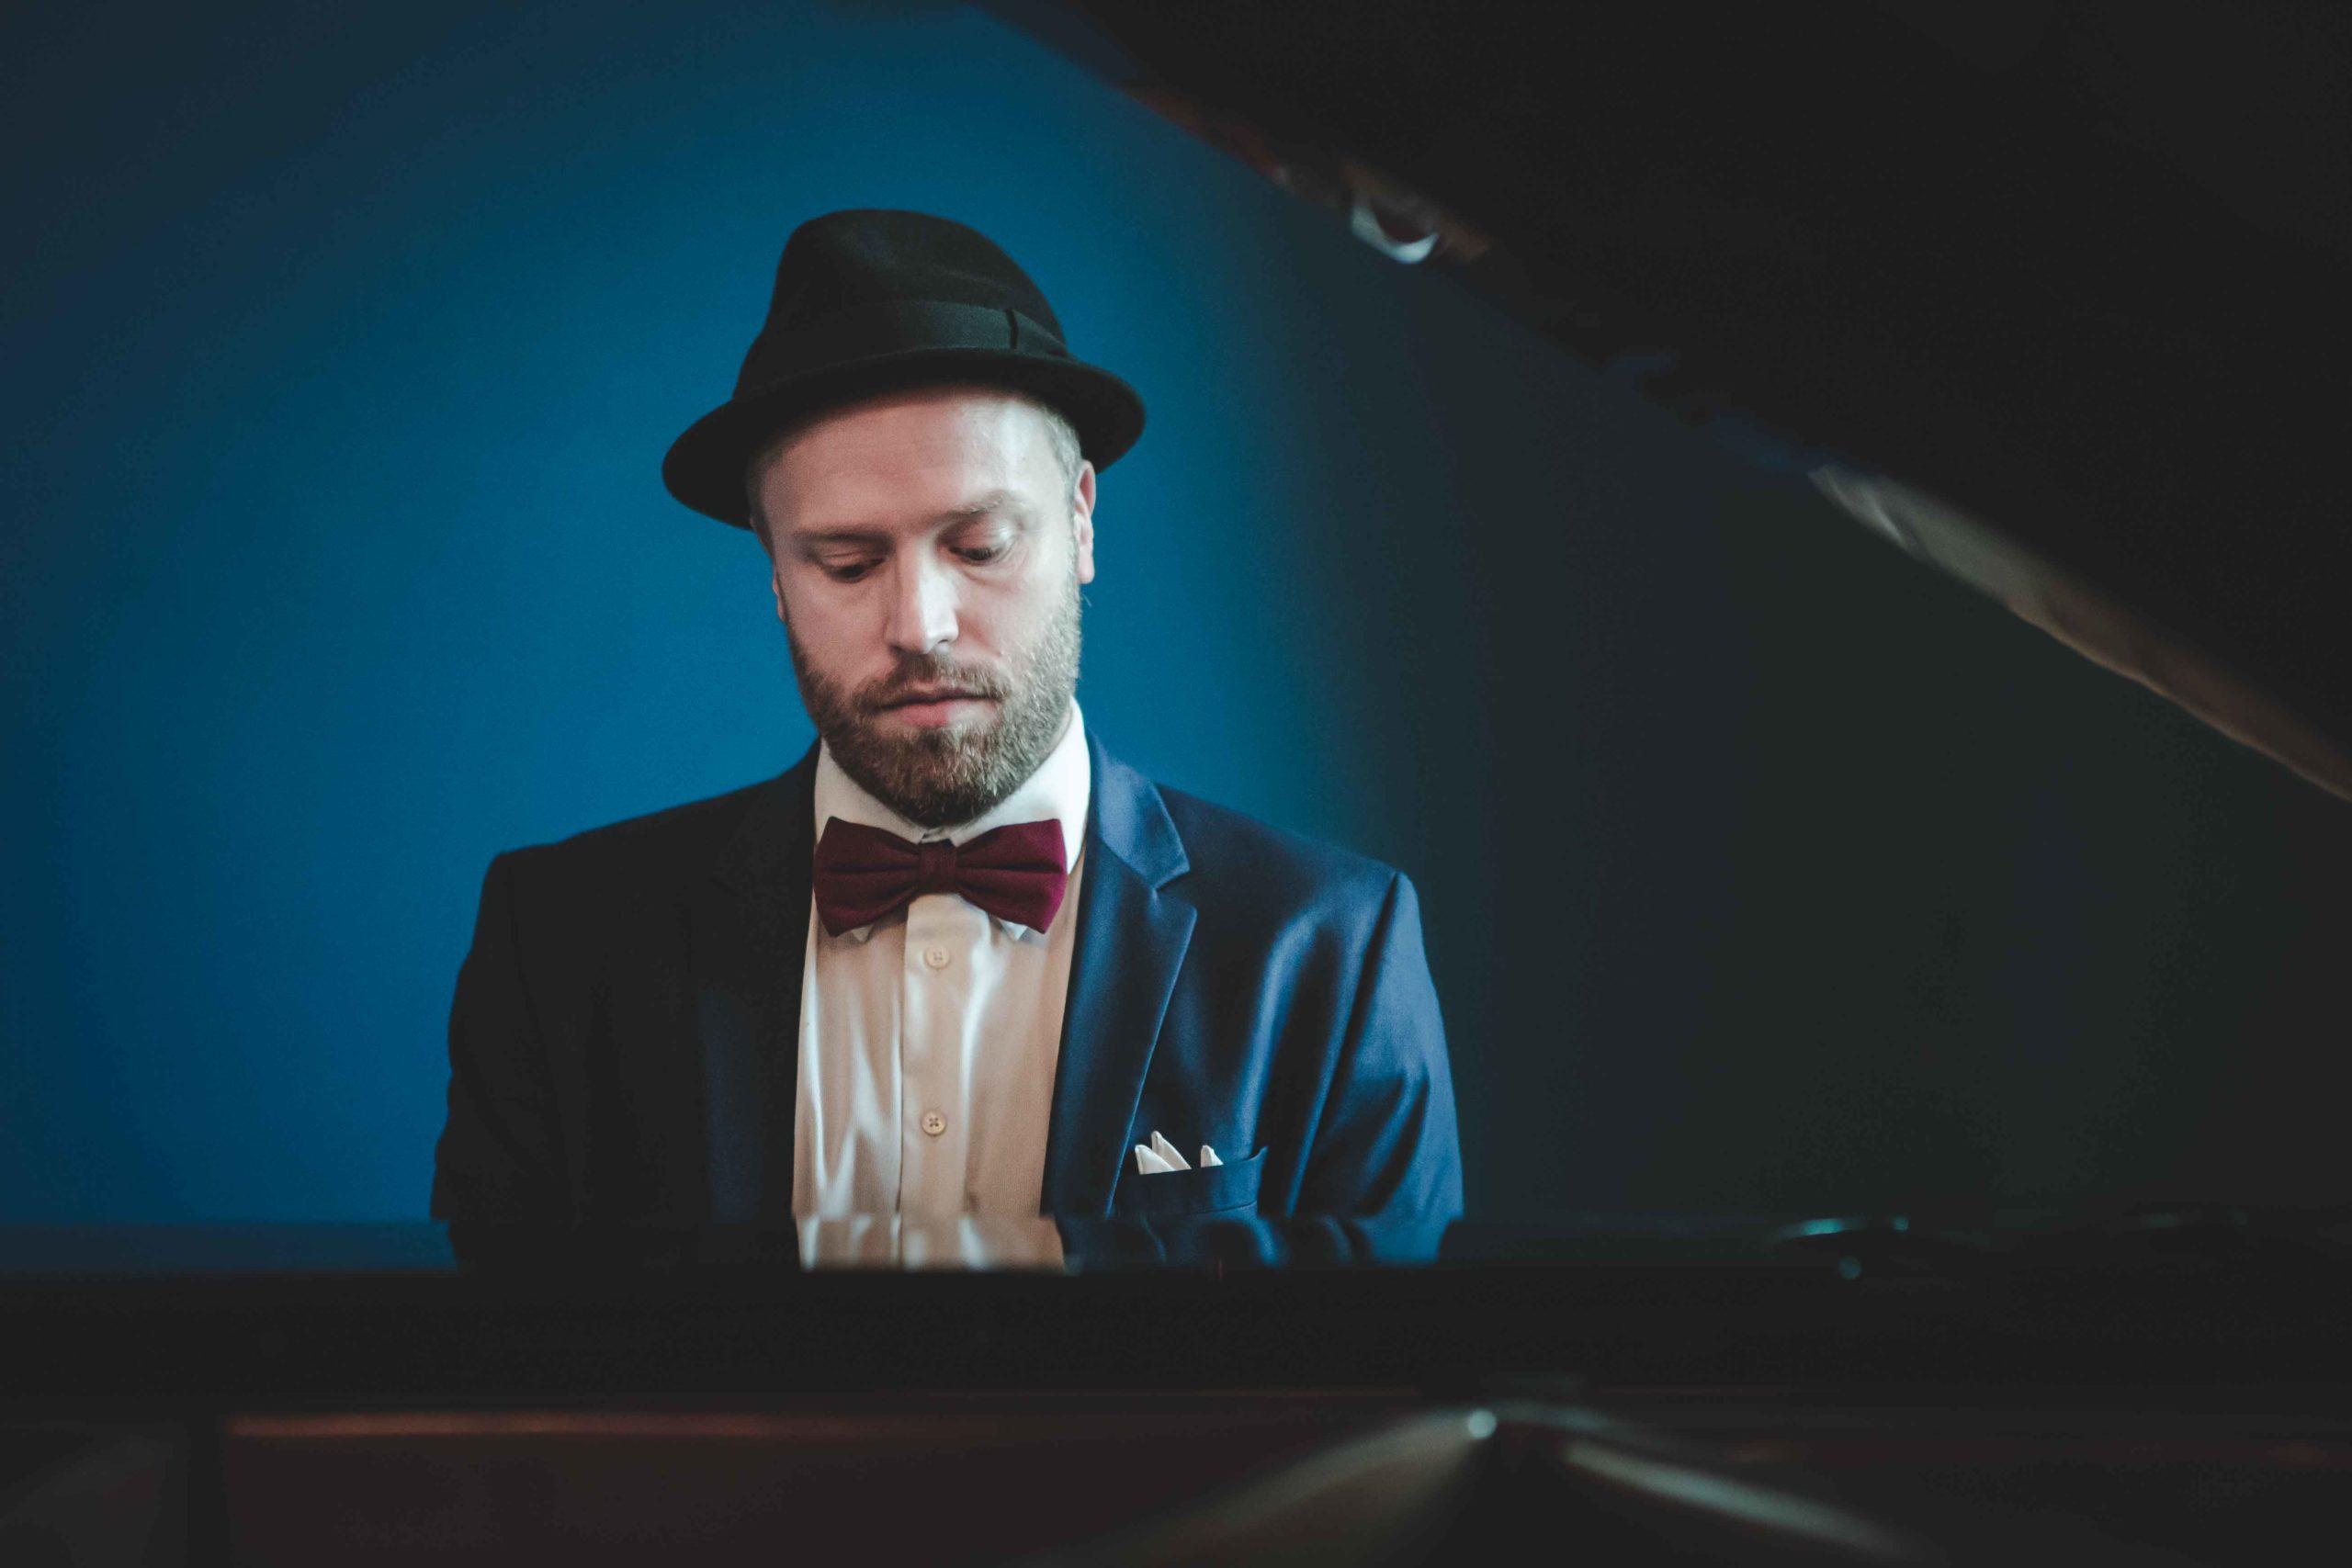 Oscar Gilbert tilbyder dinnerpiano, jazzband og festmusik